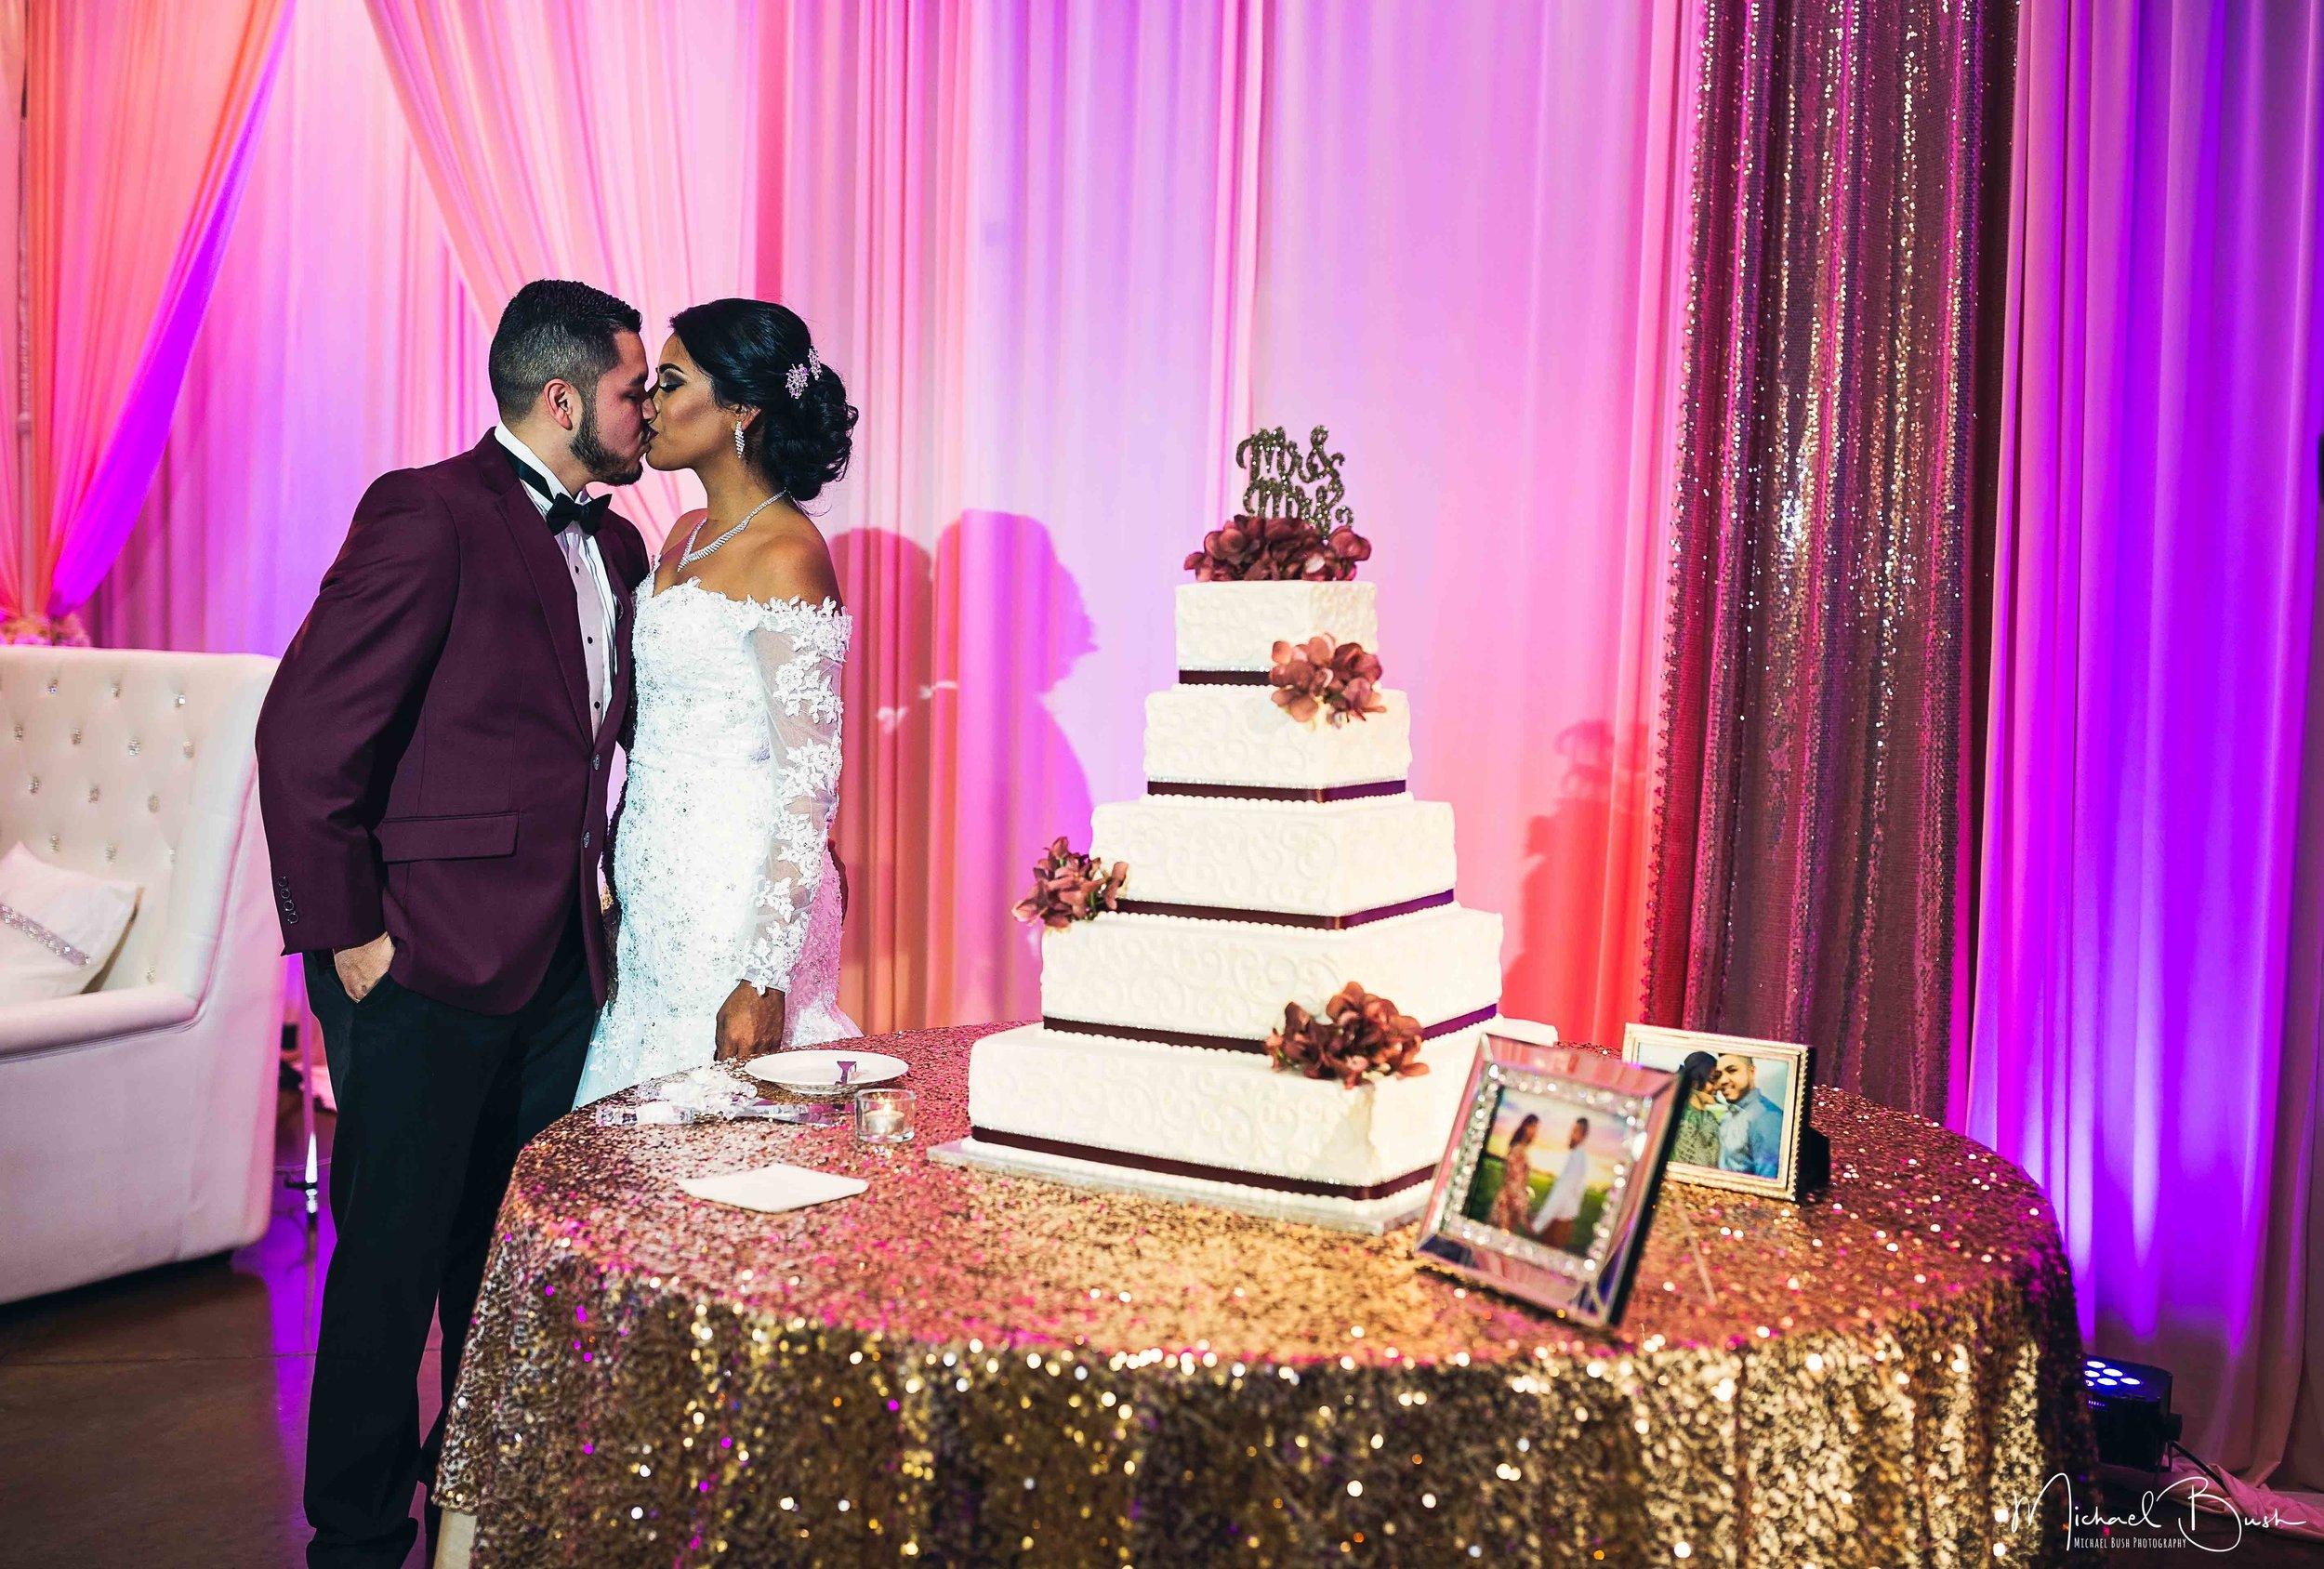 Wedding-Reception-Detials-Fort-Worth-Venue-cake-kiss.jpg